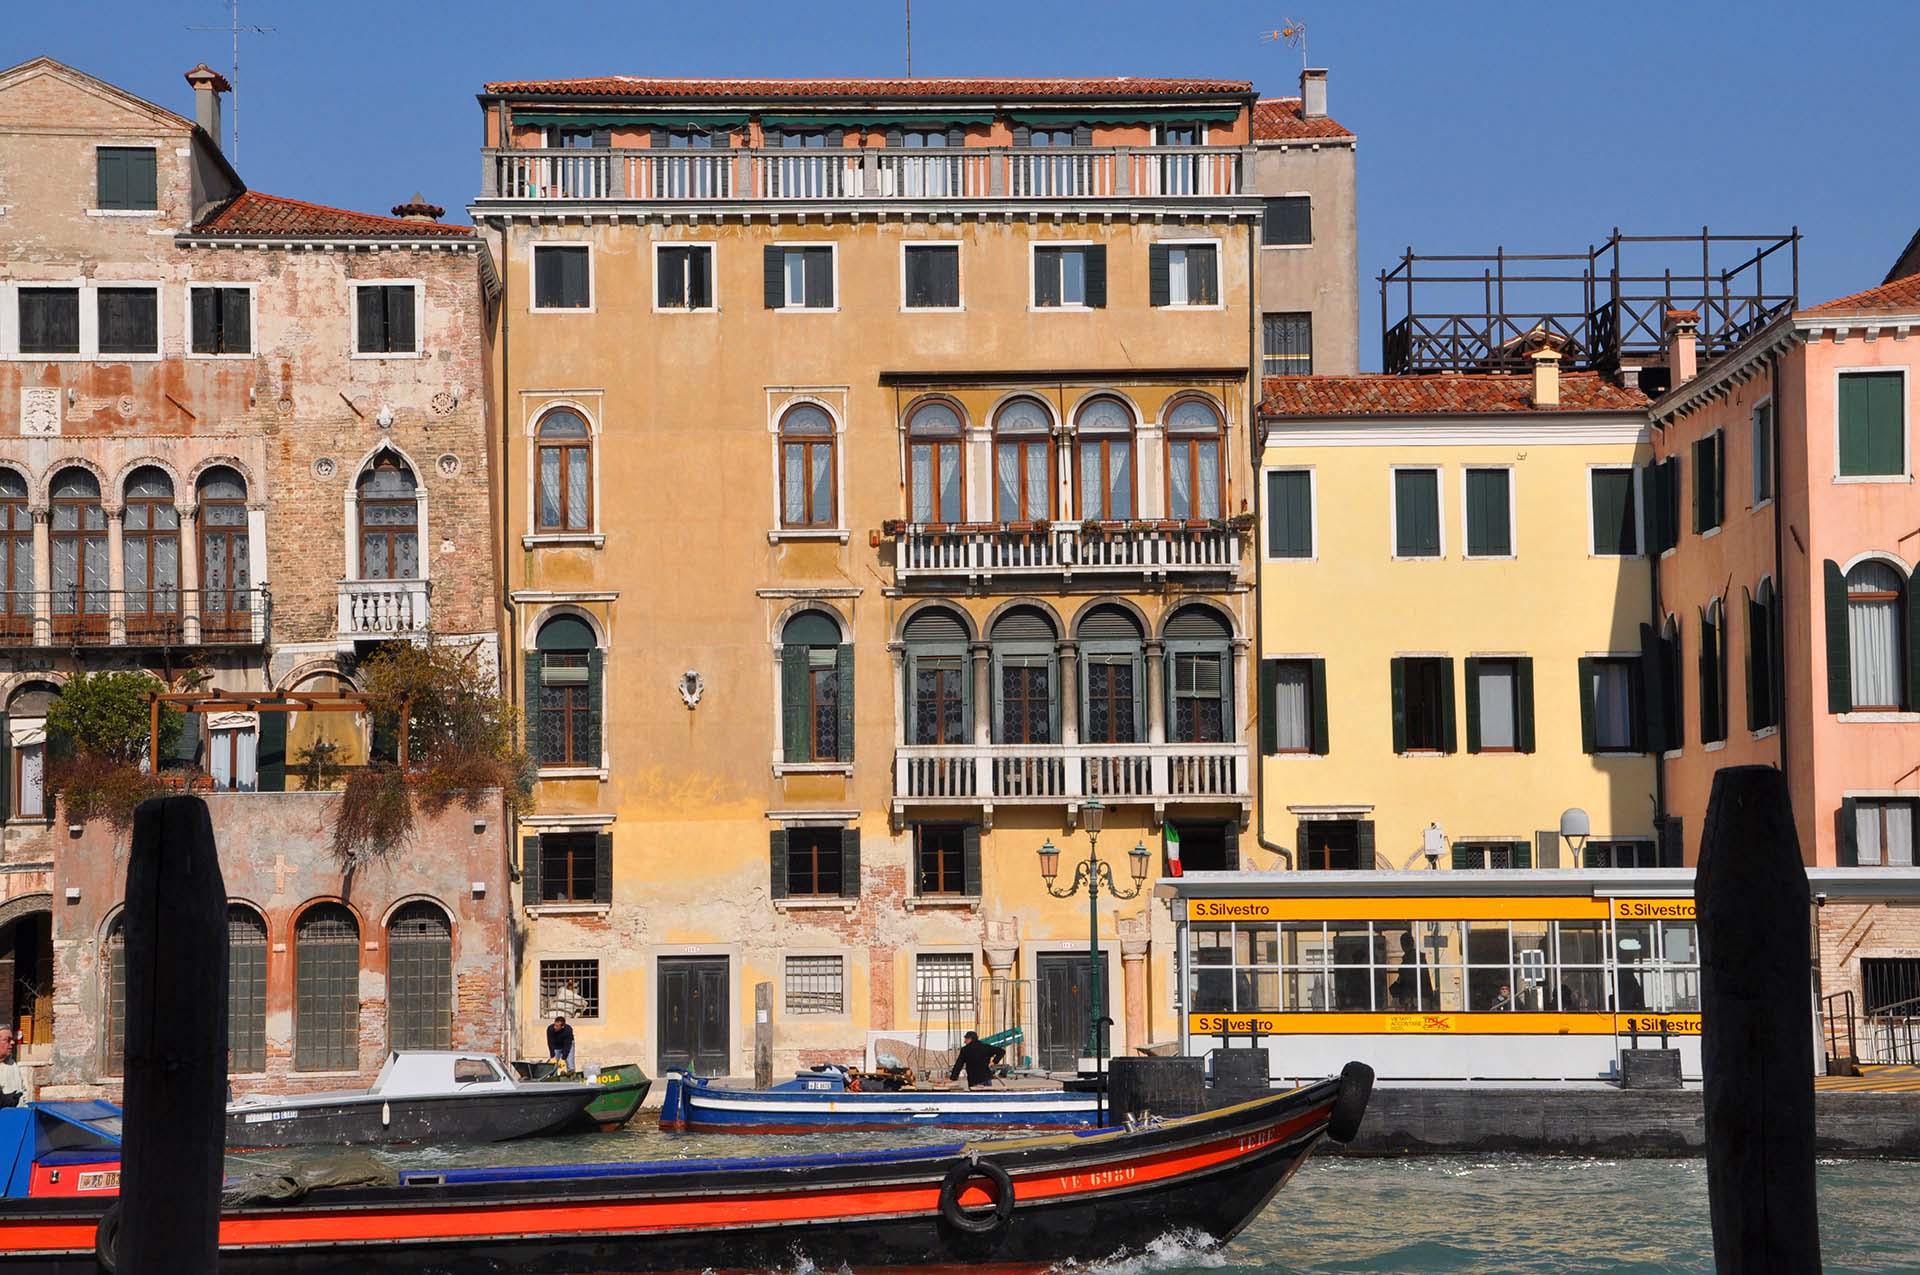 san polo 1116, venezia